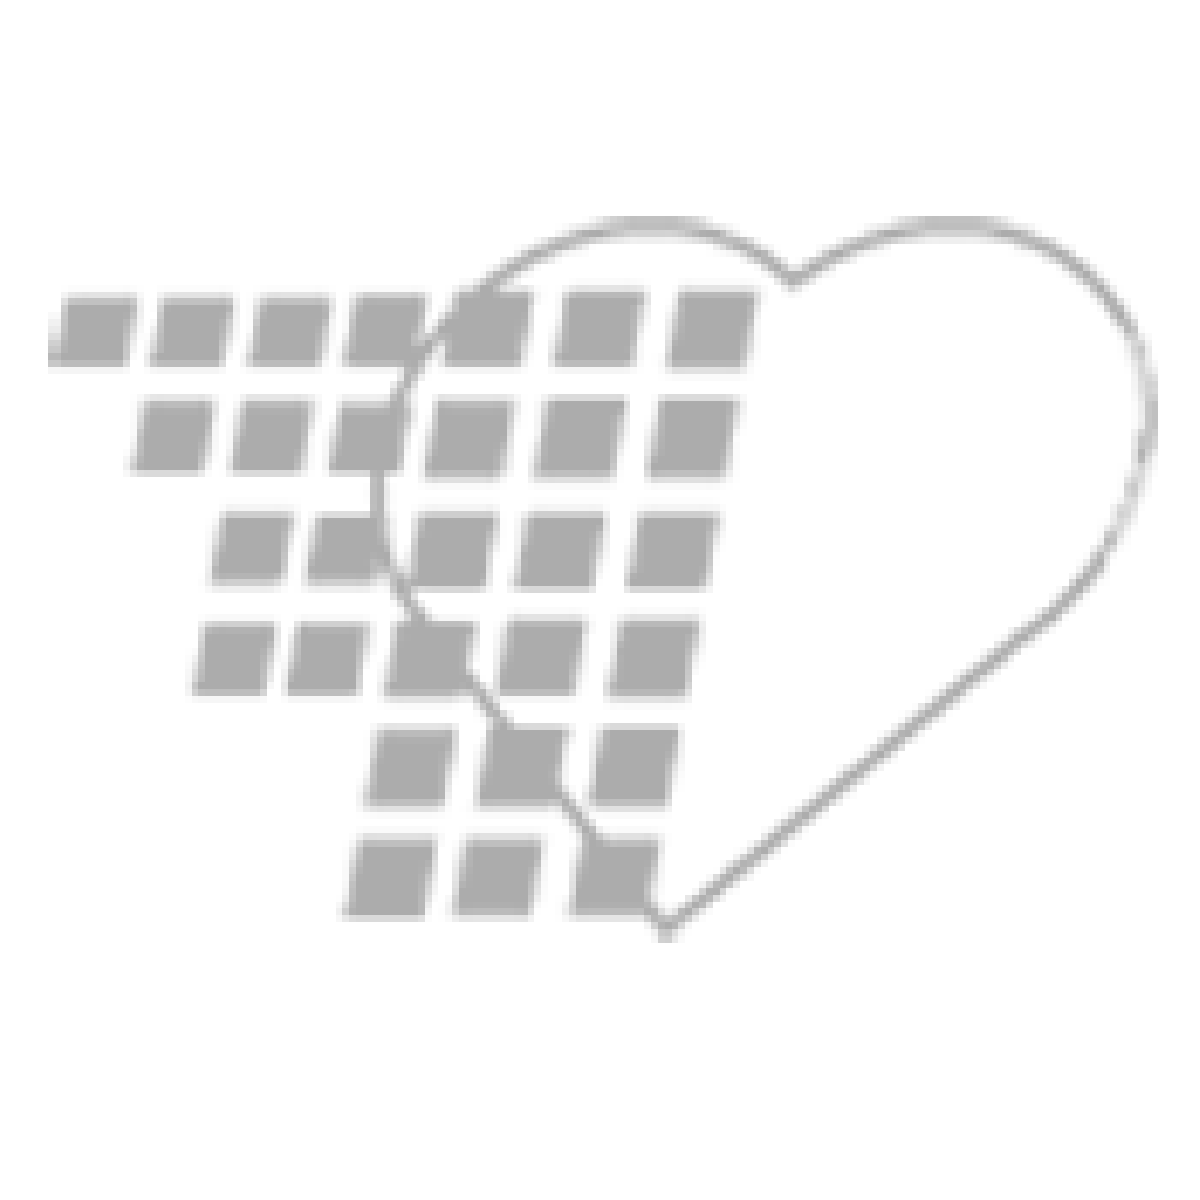 06-99-0408 - Chester Chest   PICC Line